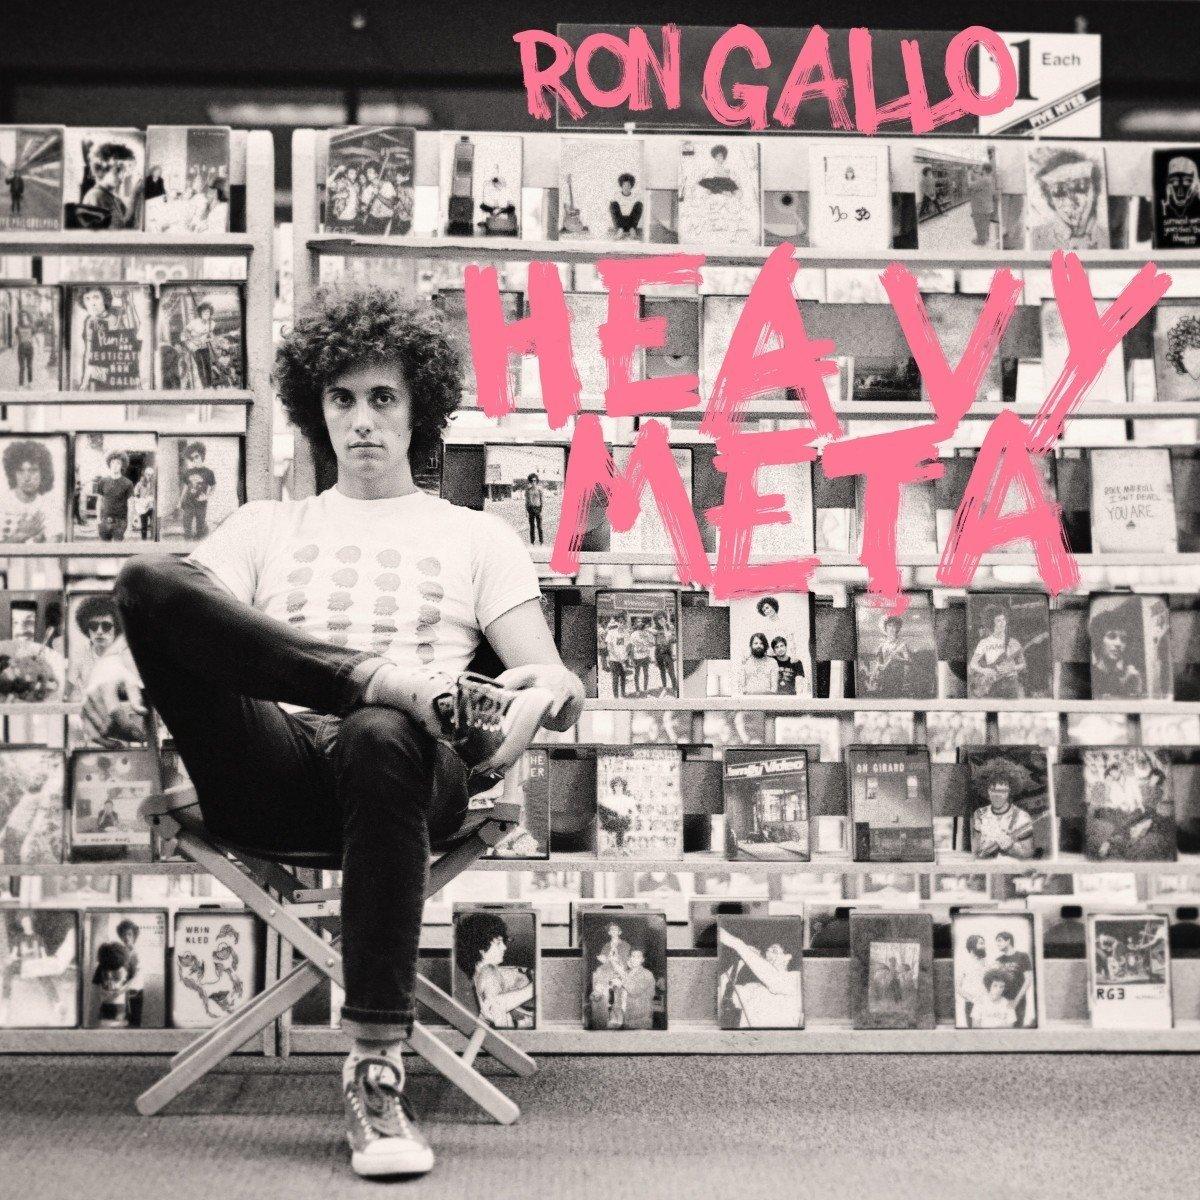 Album Review: Ron Gallo's 'Heavy Meta'